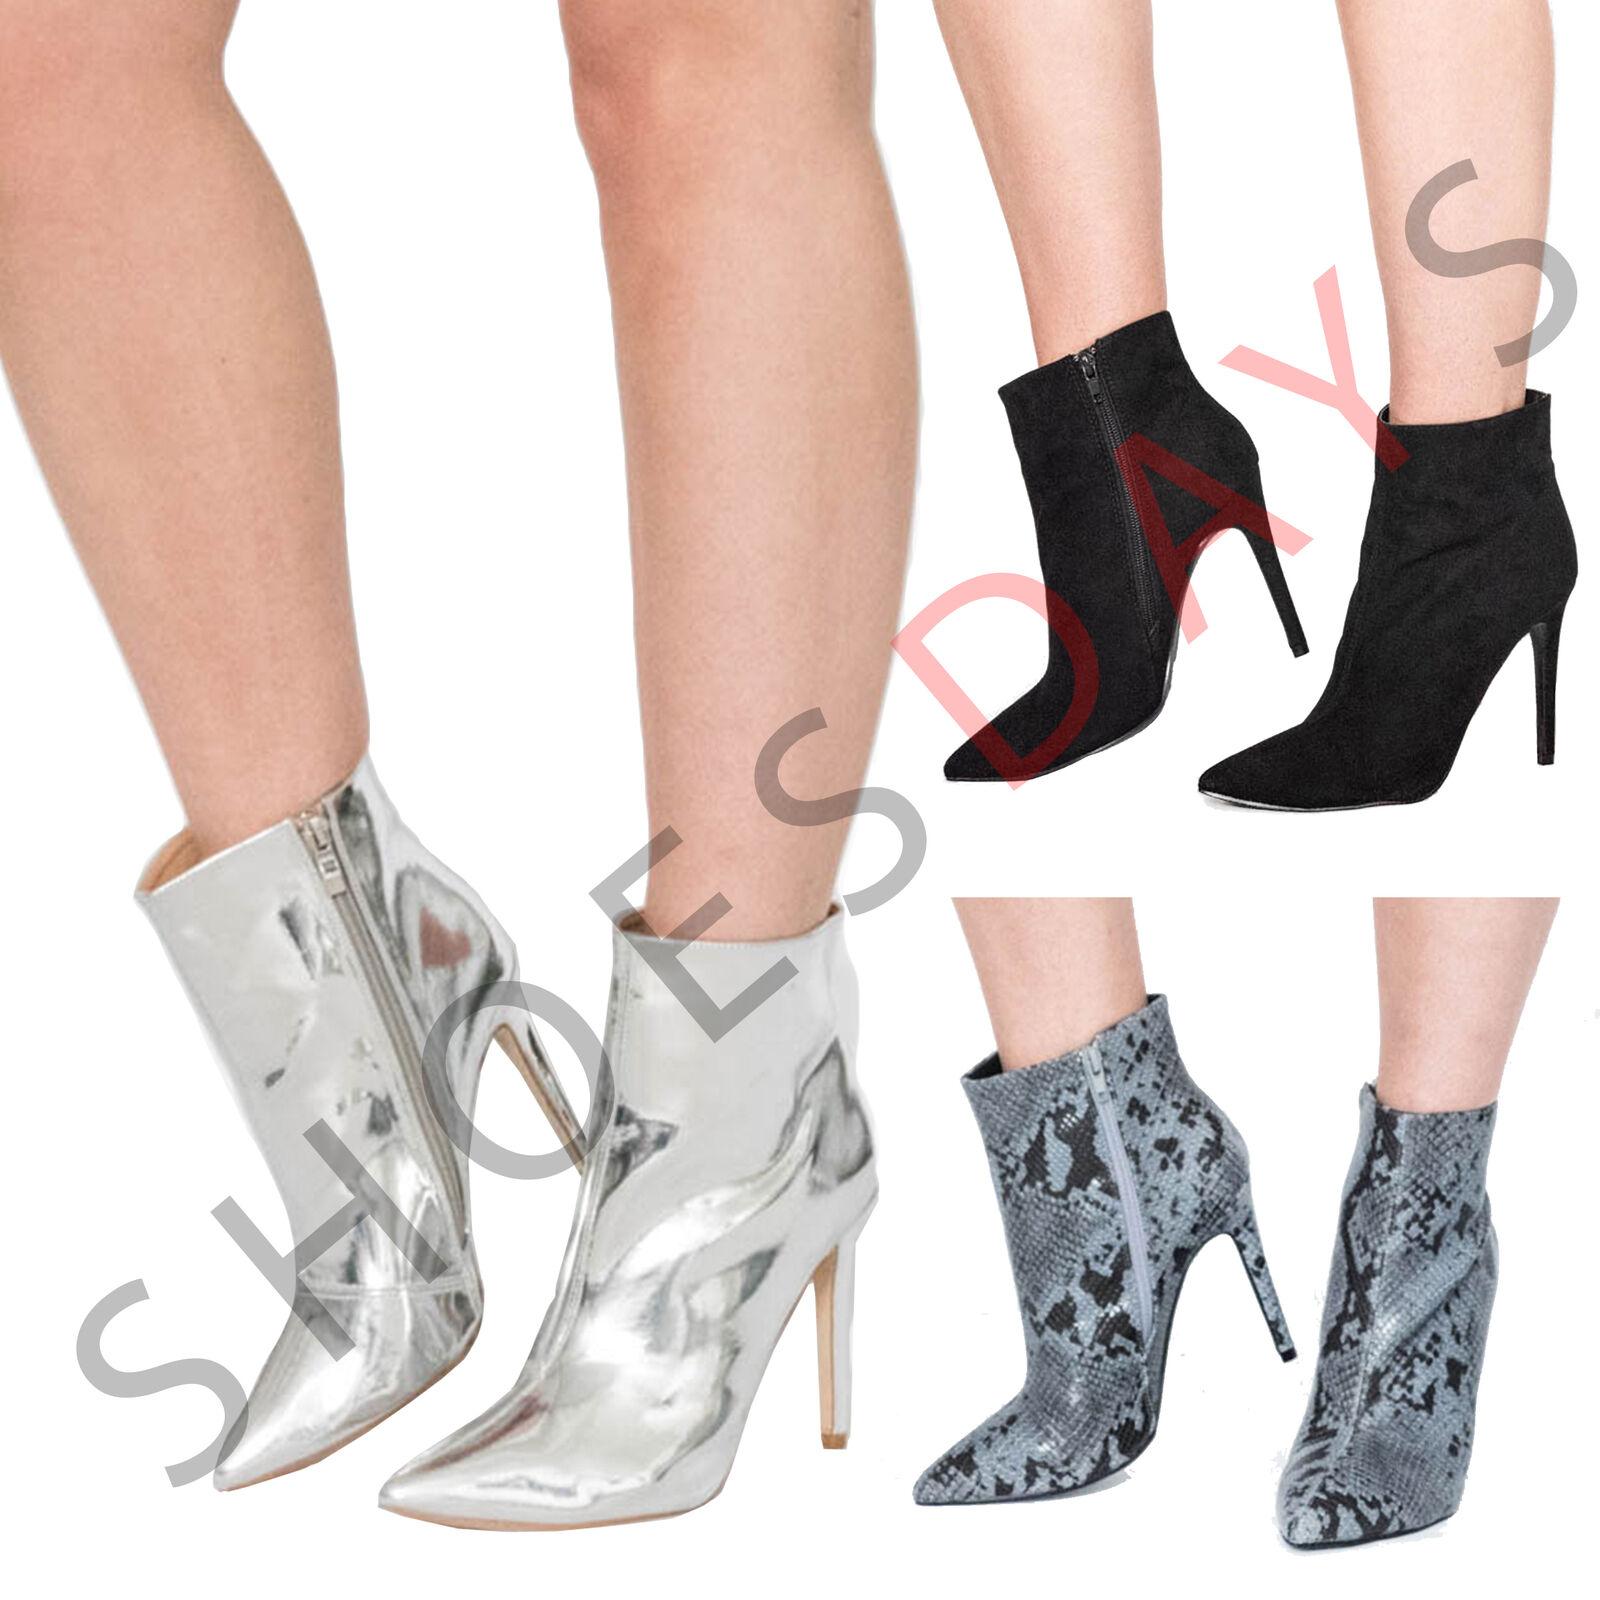 Ladies High Plata Shiny Metallic Mirror High Ladies Heel Ankle botas Pointed Toe Zapatos Talla a5923a